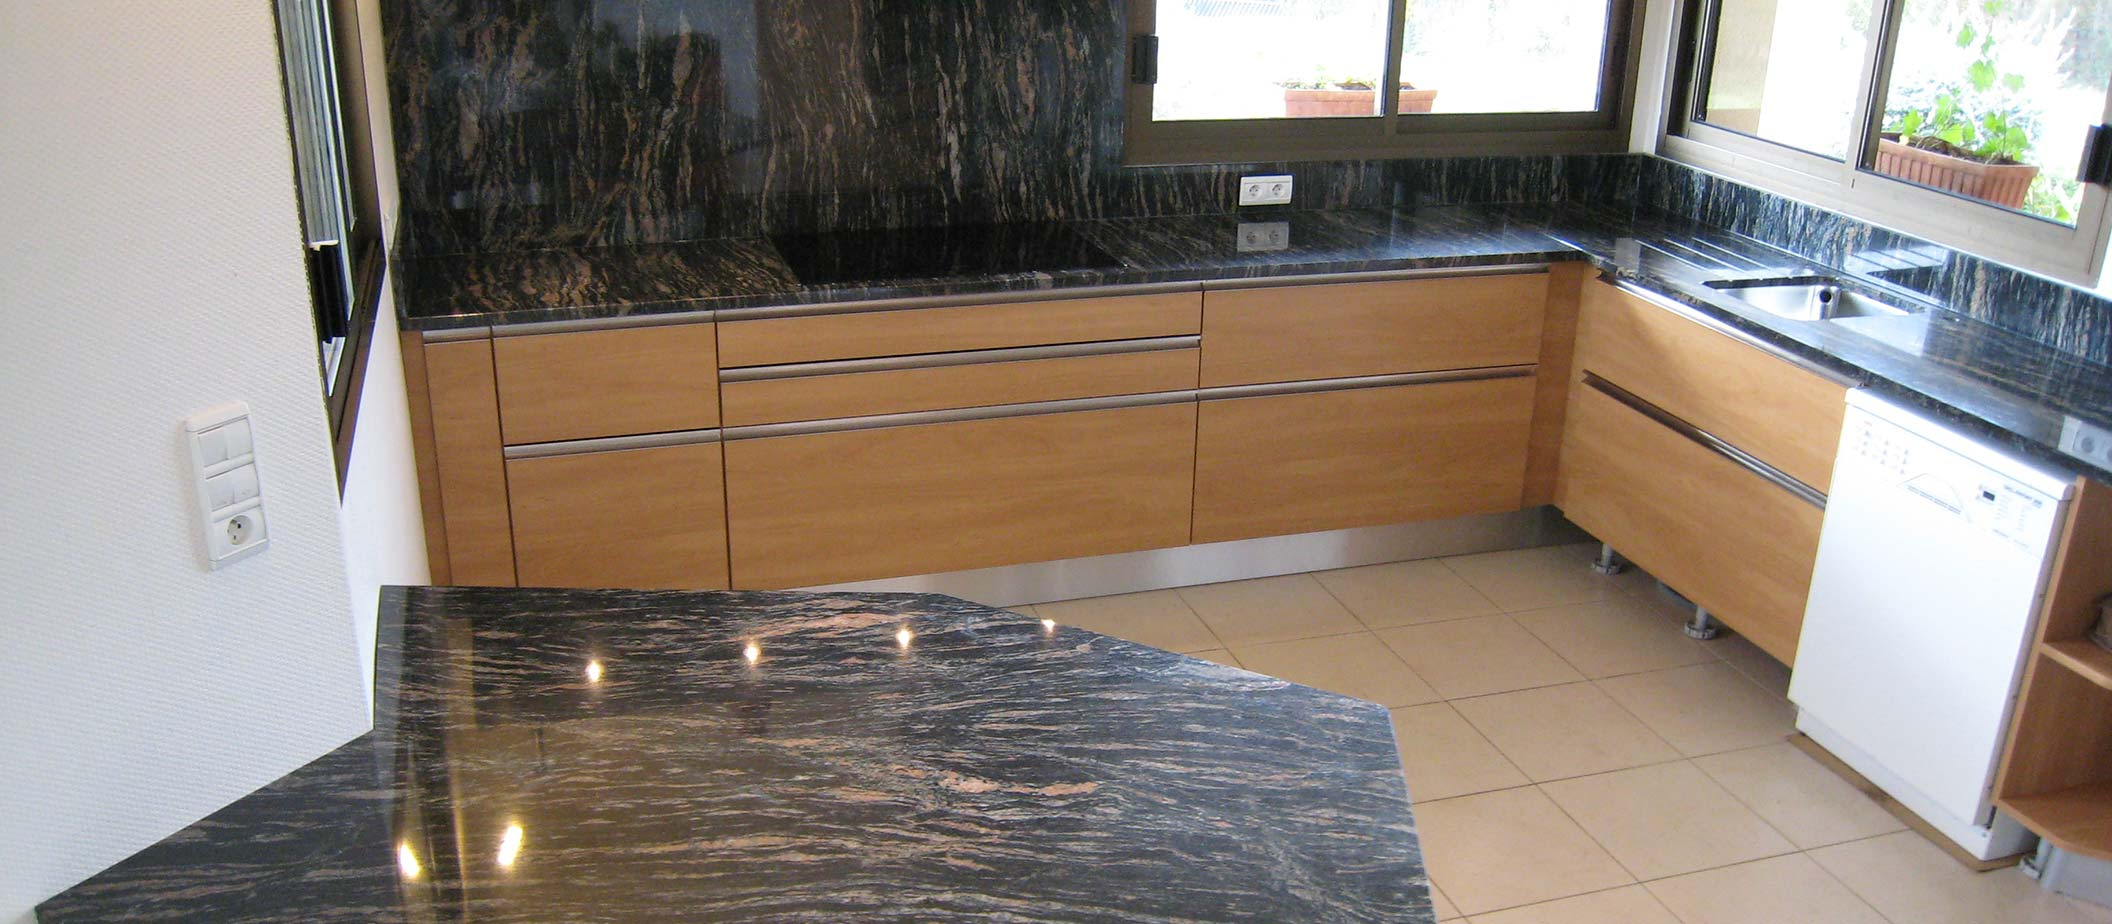 la sarl lagarde artisan granitier et marbrier toulouse. Black Bedroom Furniture Sets. Home Design Ideas